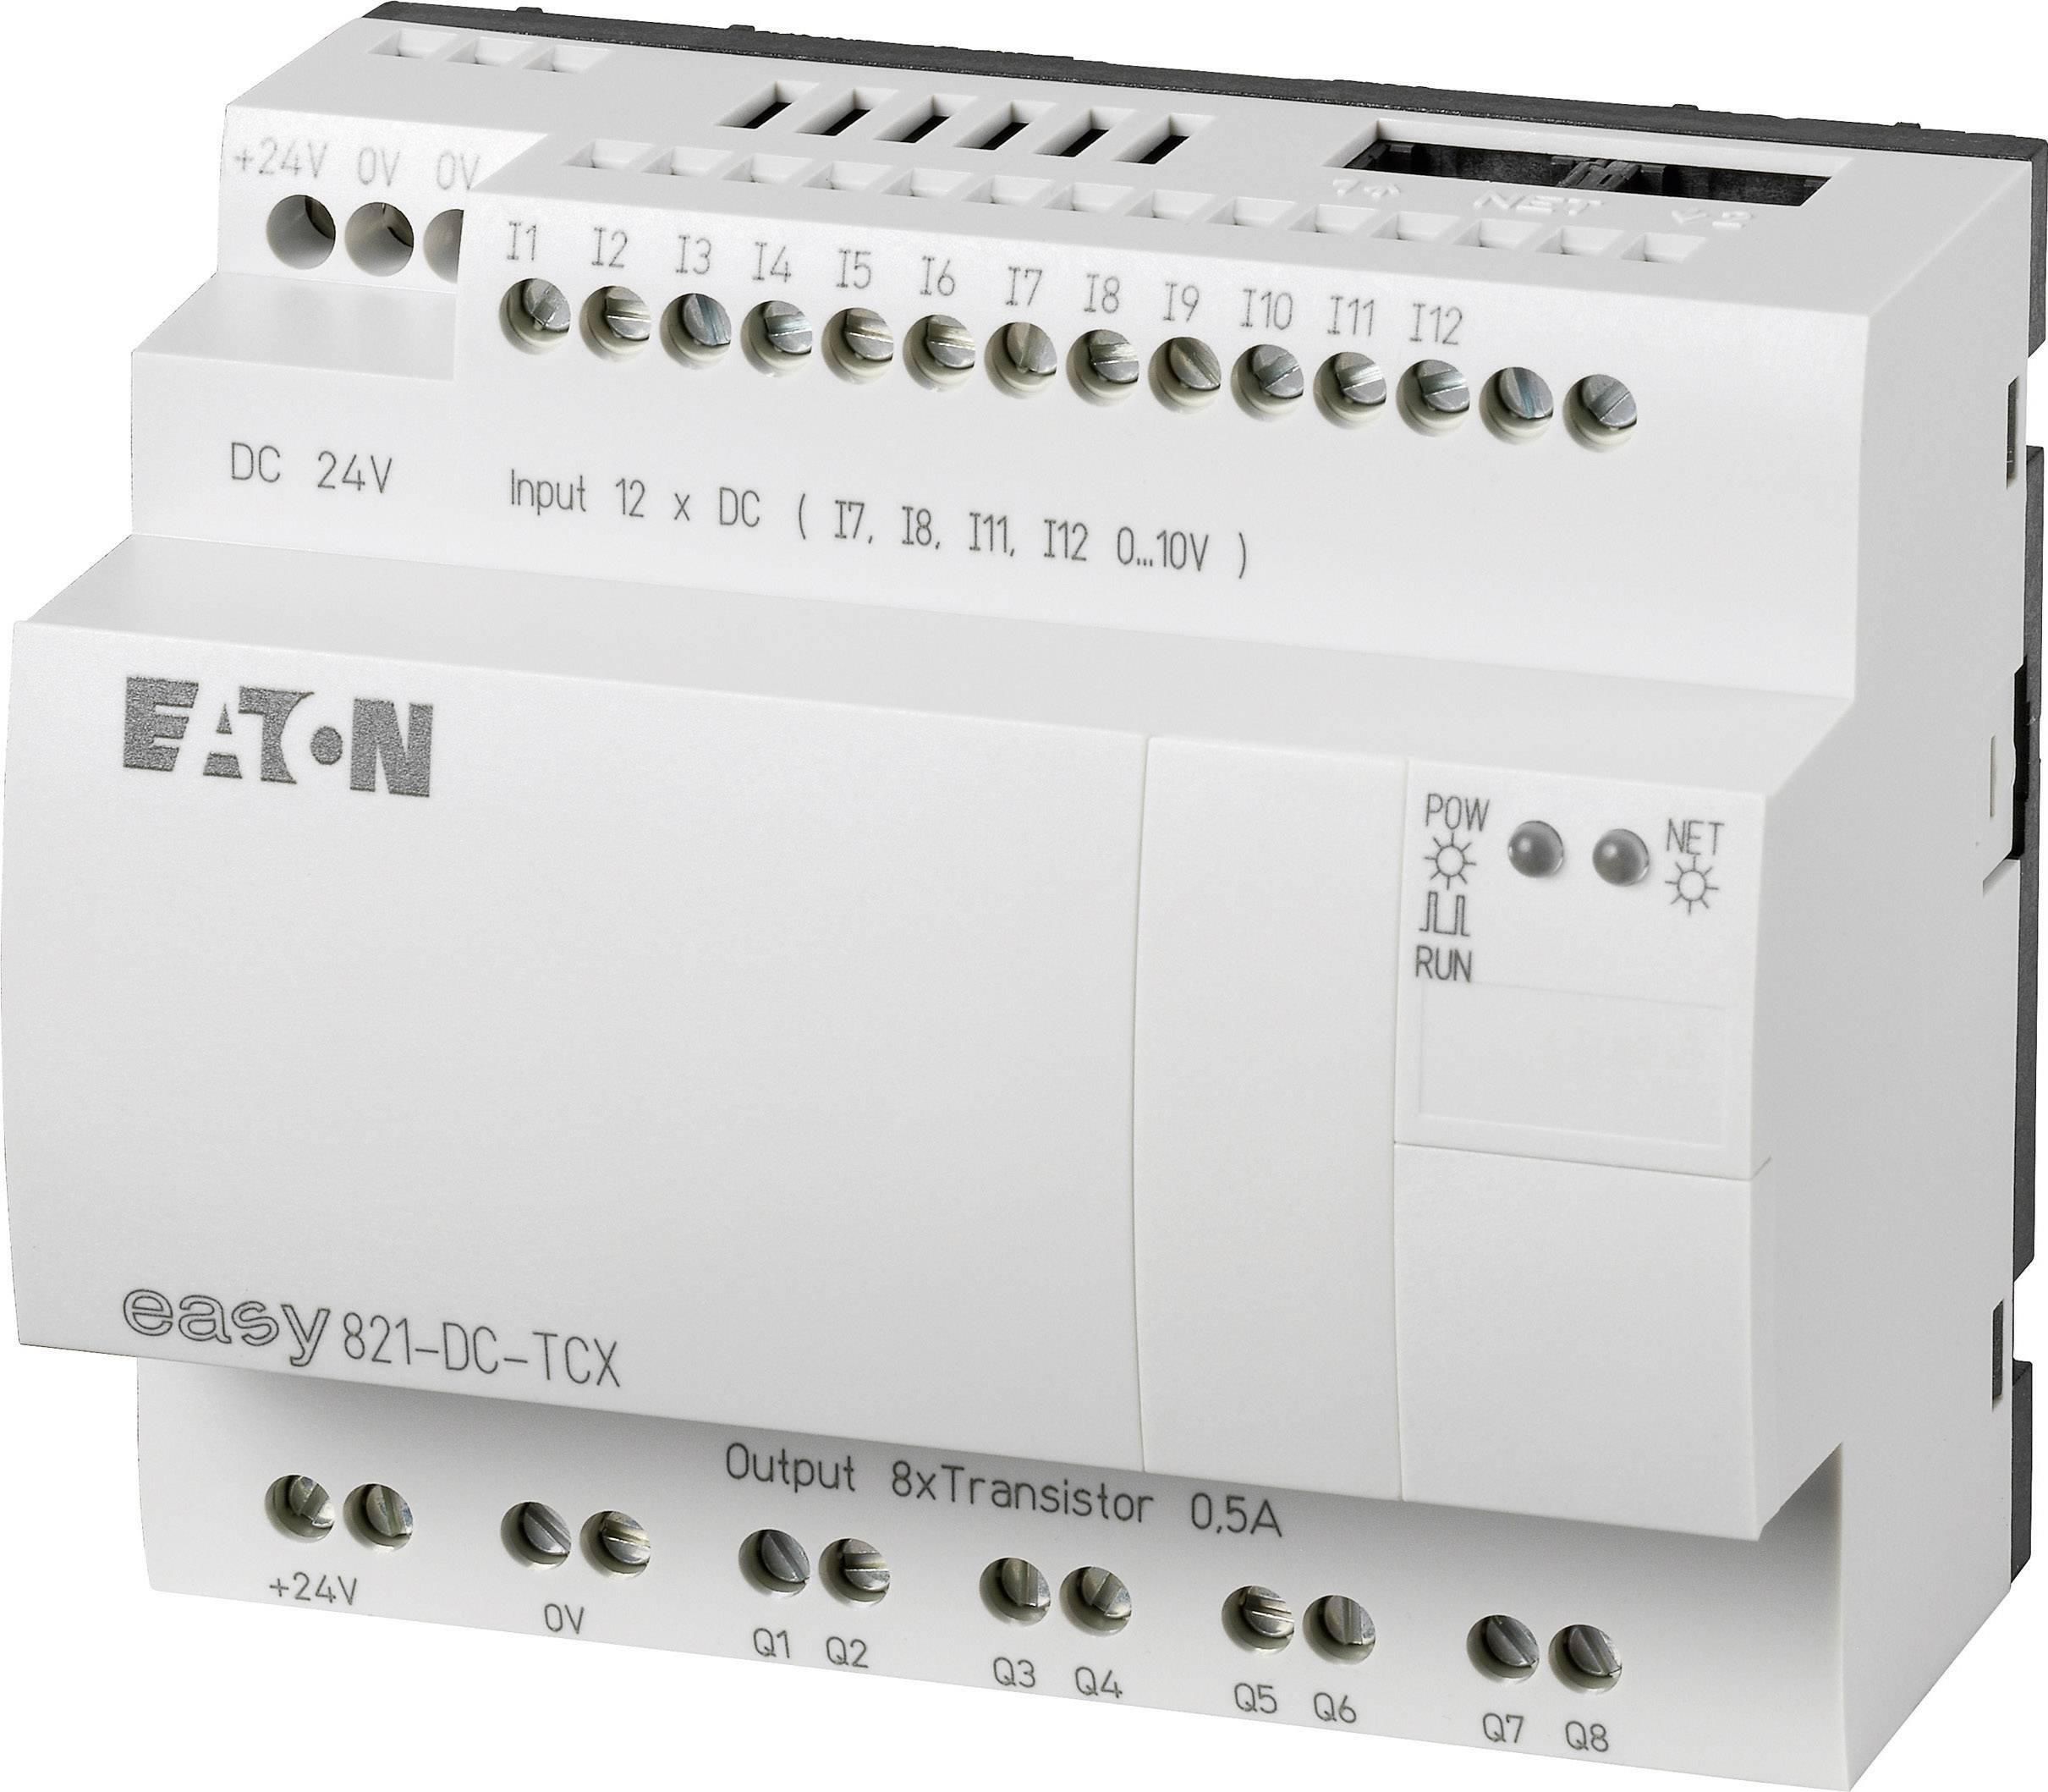 Řídicí reléový modul Eaton easy 821-DC-TCX (256274), IP20, 12, 8x tranzistor